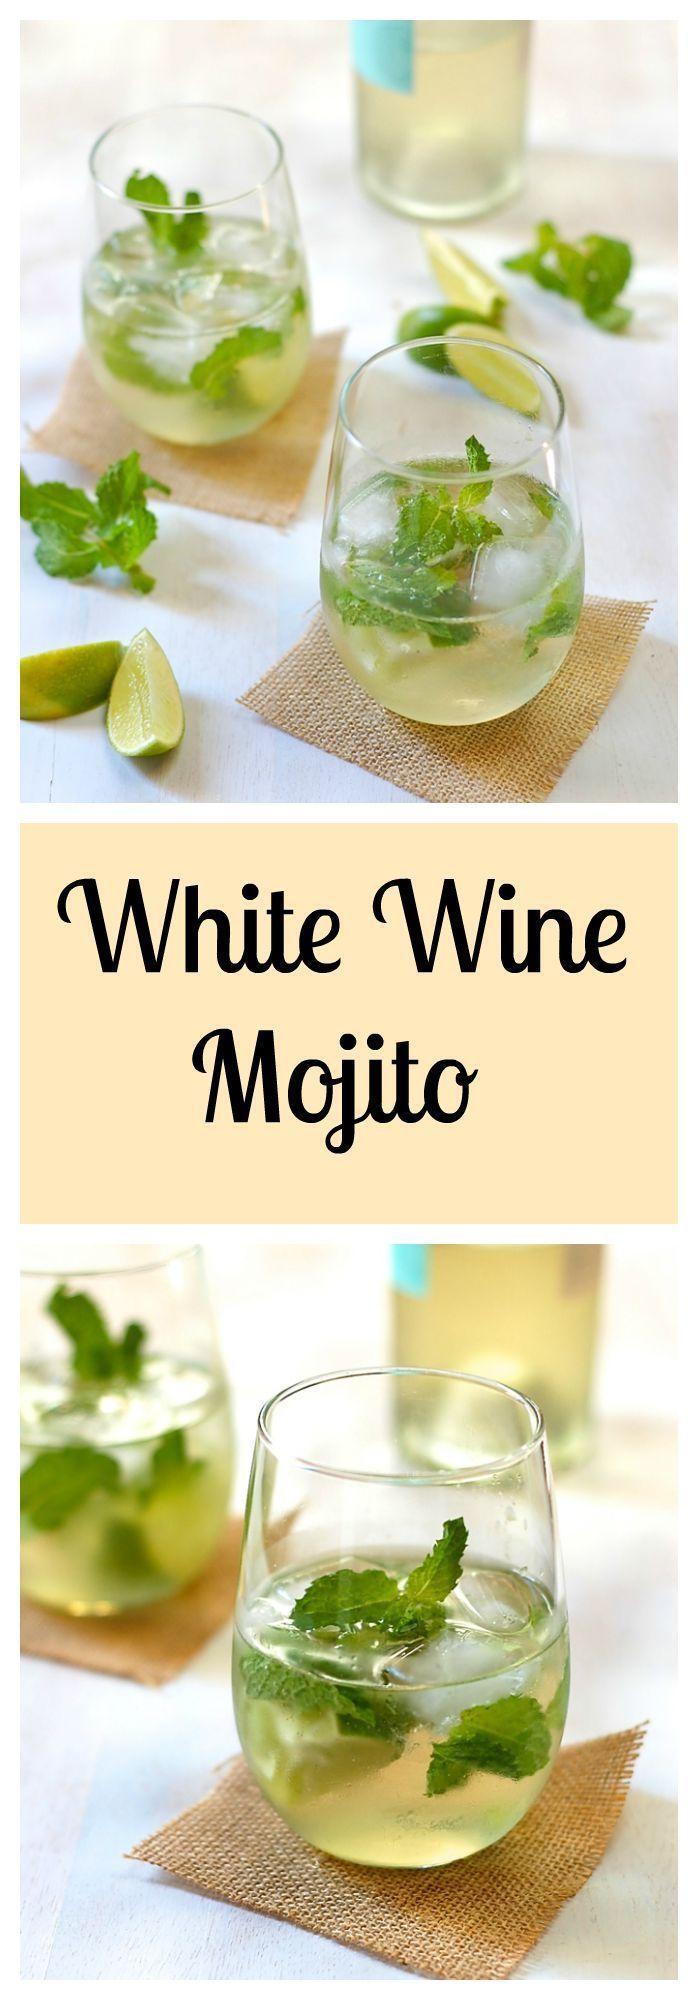 die besten 25 gin mojito recipe ideen auf pinterest bestes mojito rezept und mojito. Black Bedroom Furniture Sets. Home Design Ideas